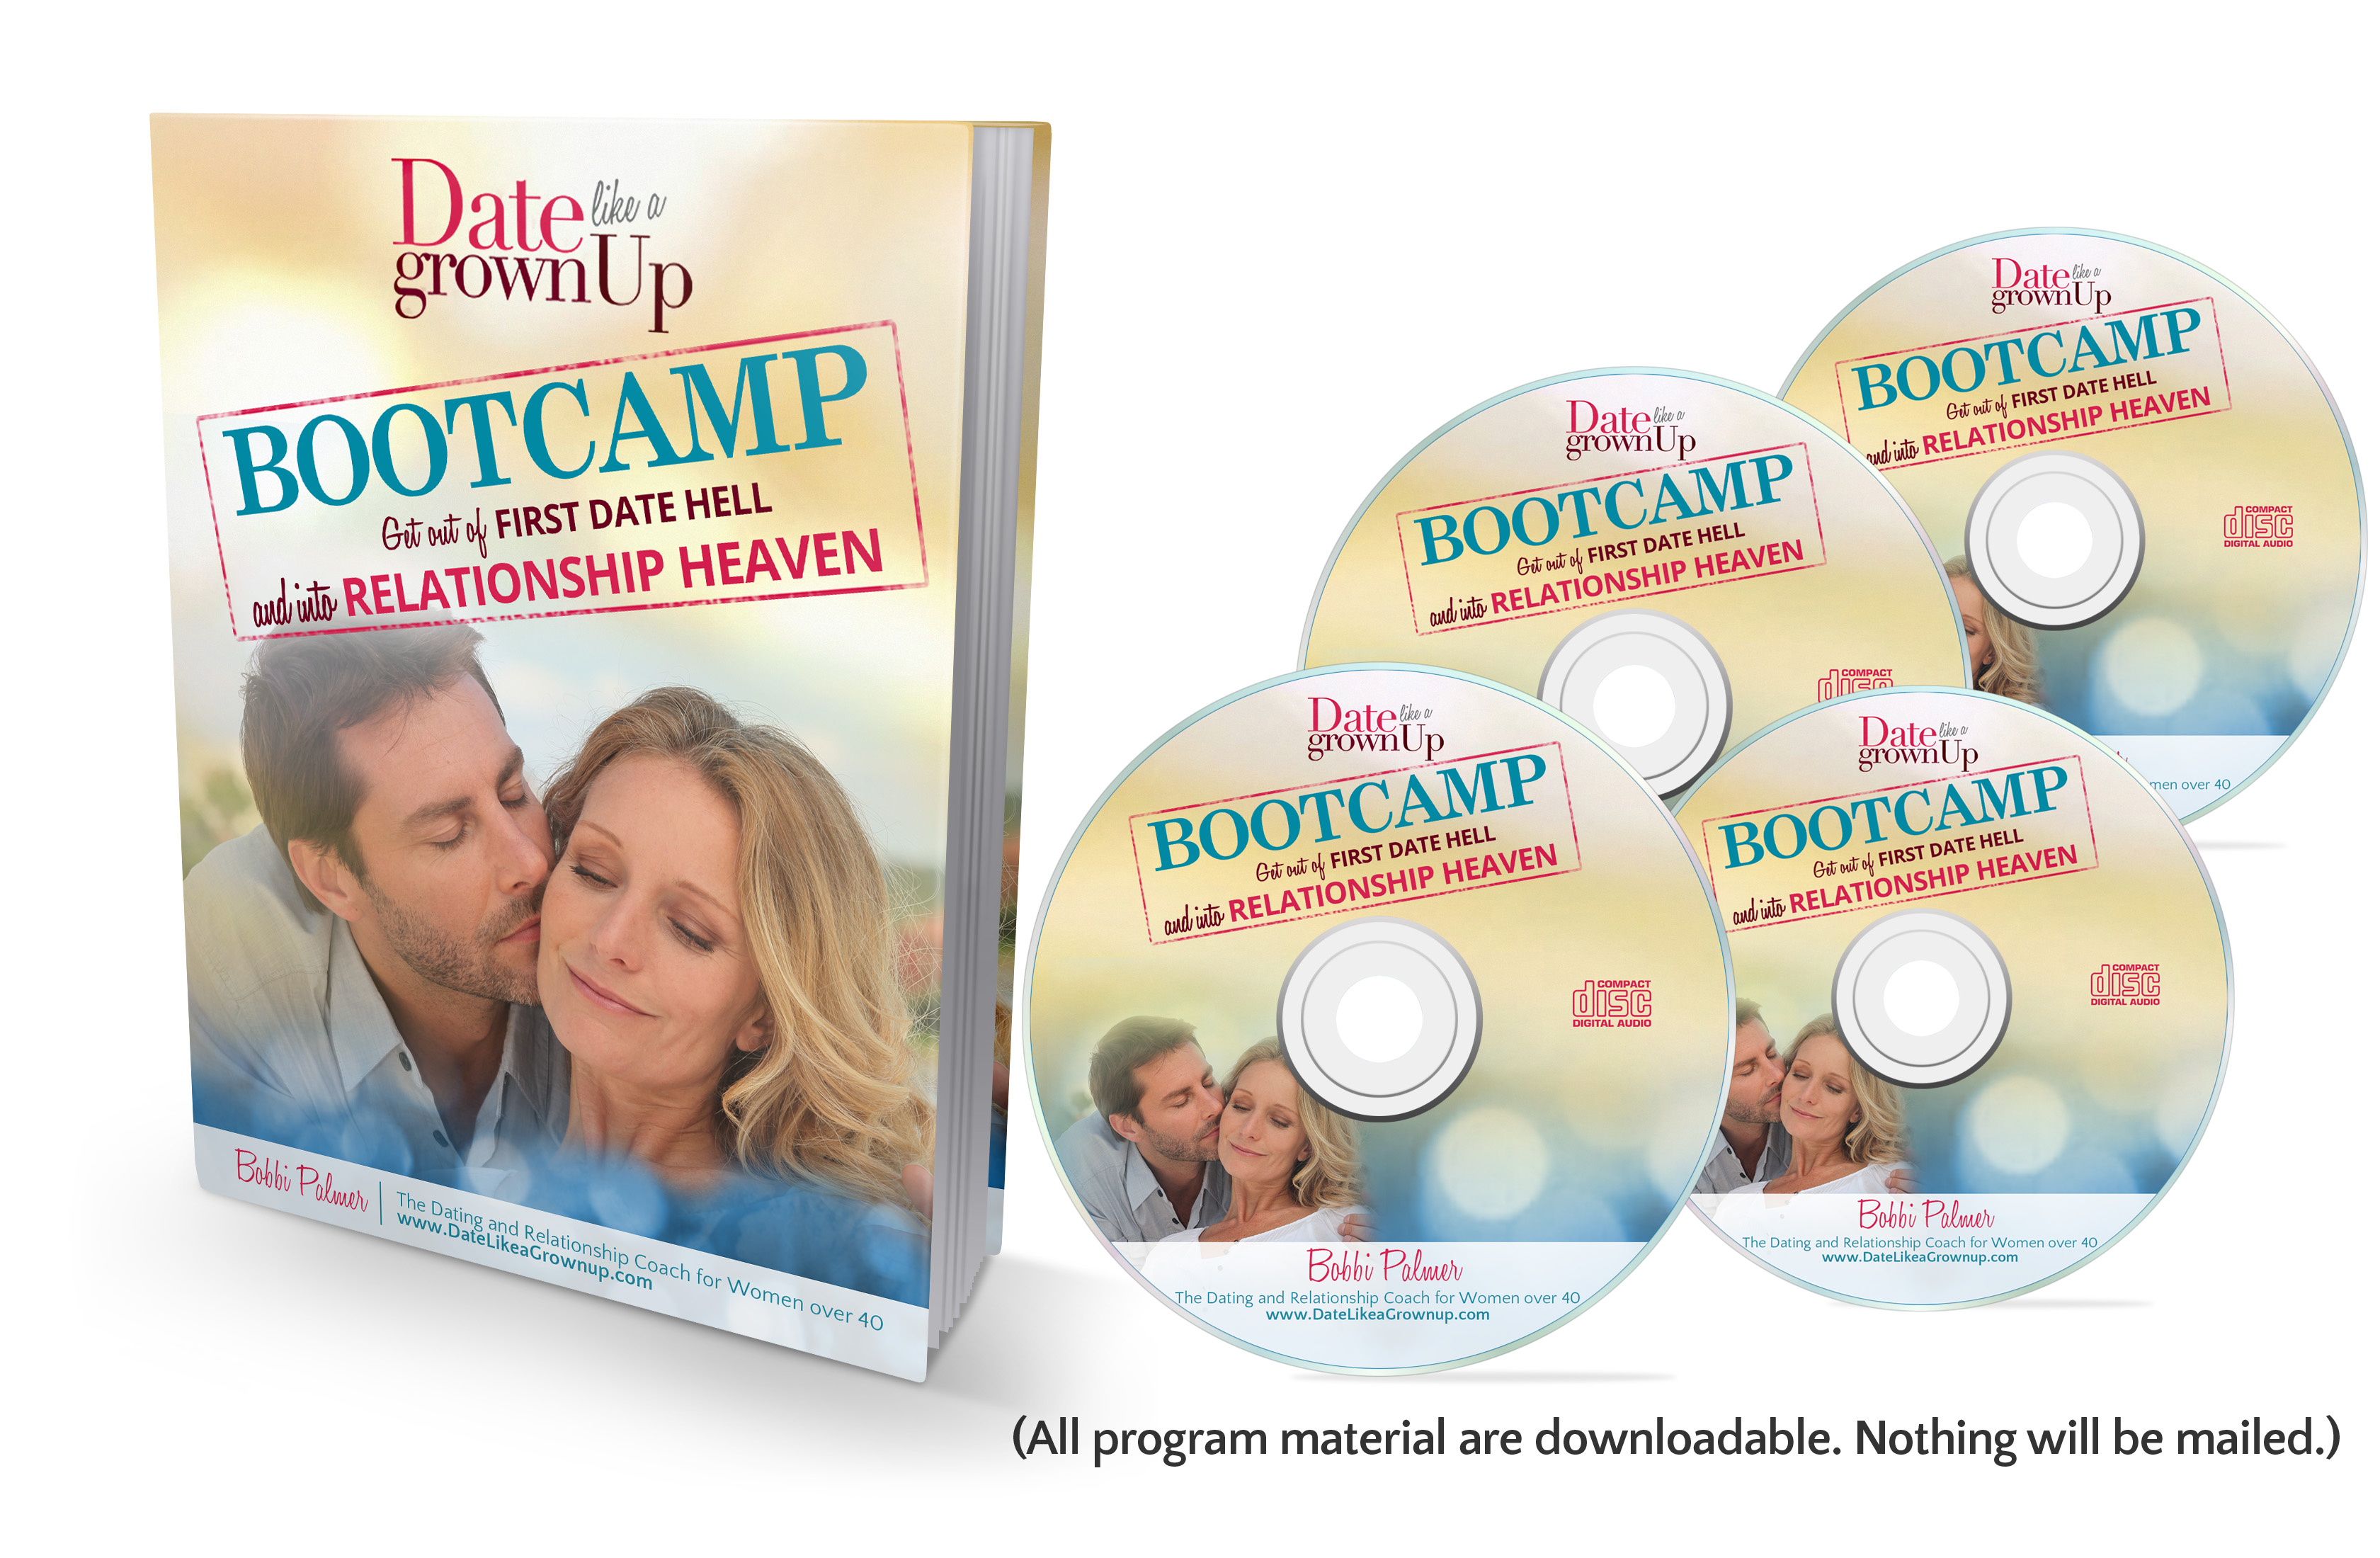 dating bootcamp dating web stranice bolton